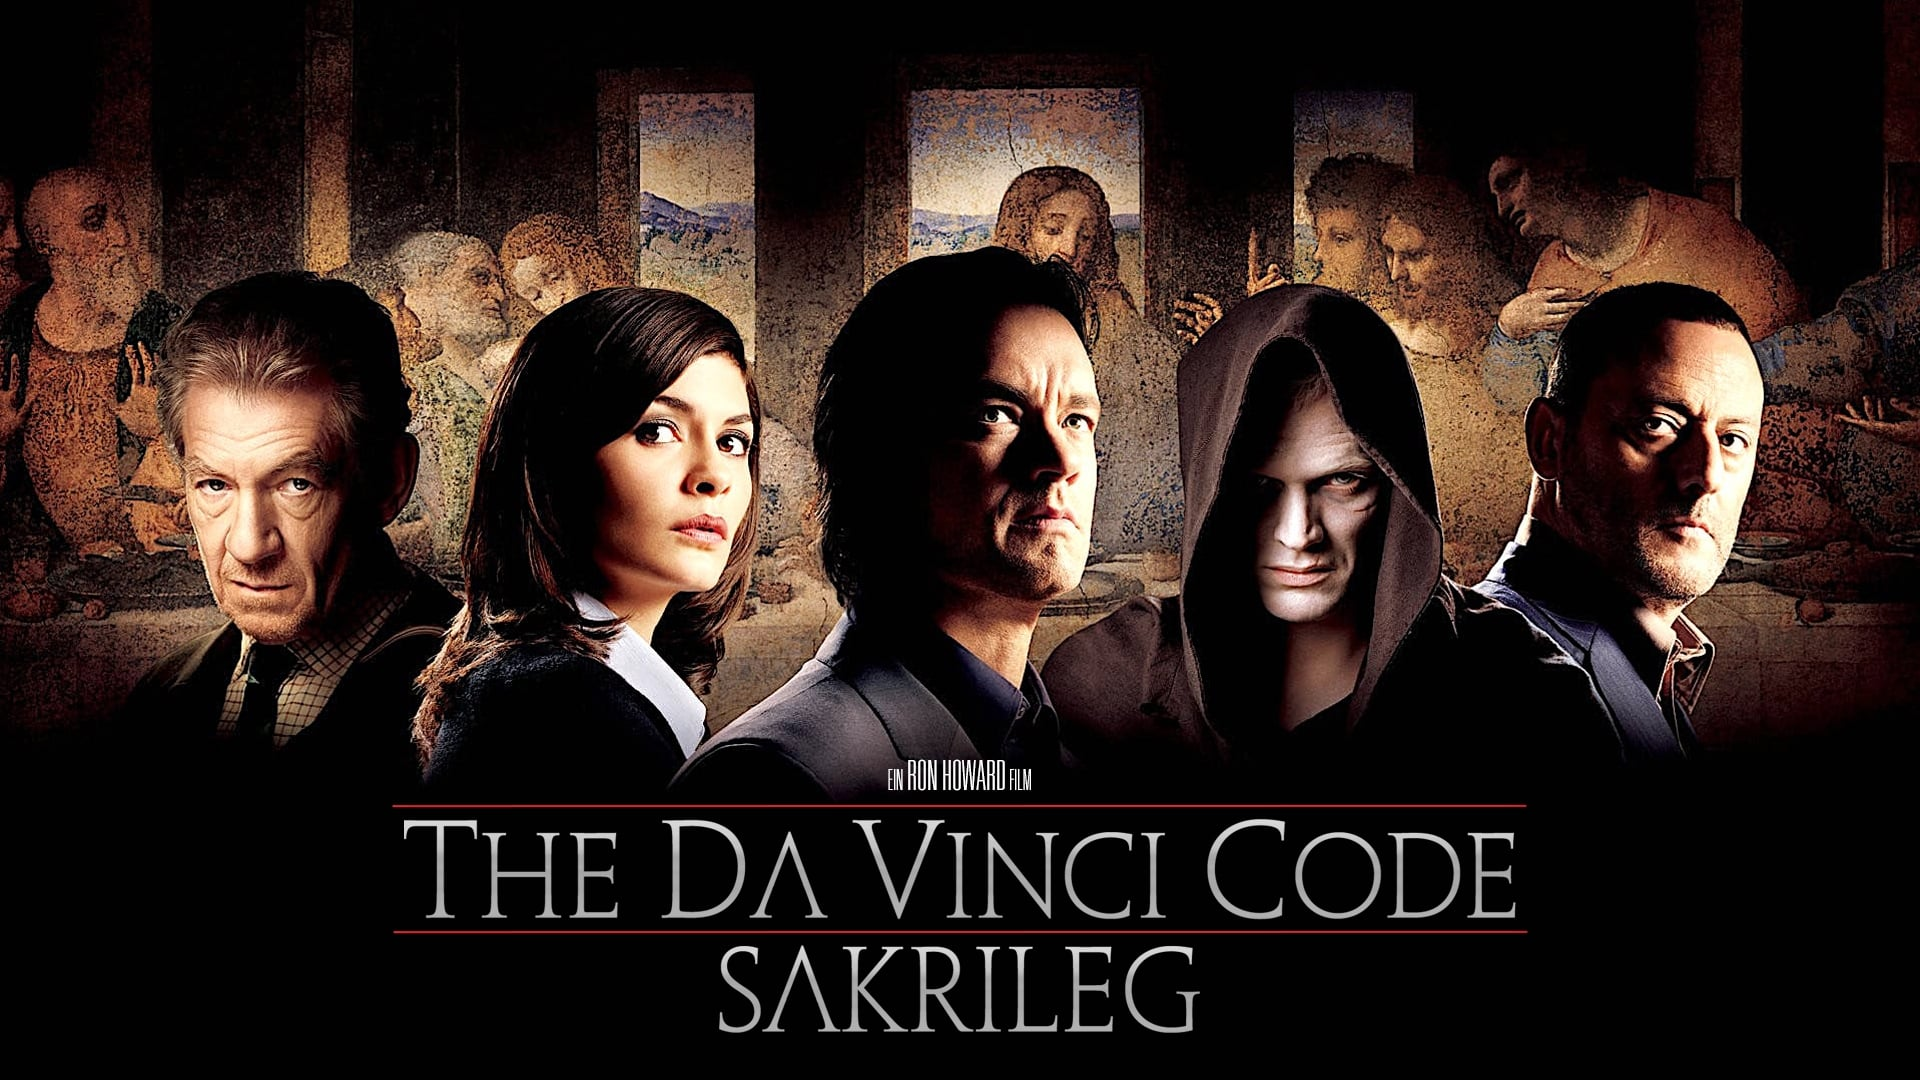 The Da Vinci Code Trailer